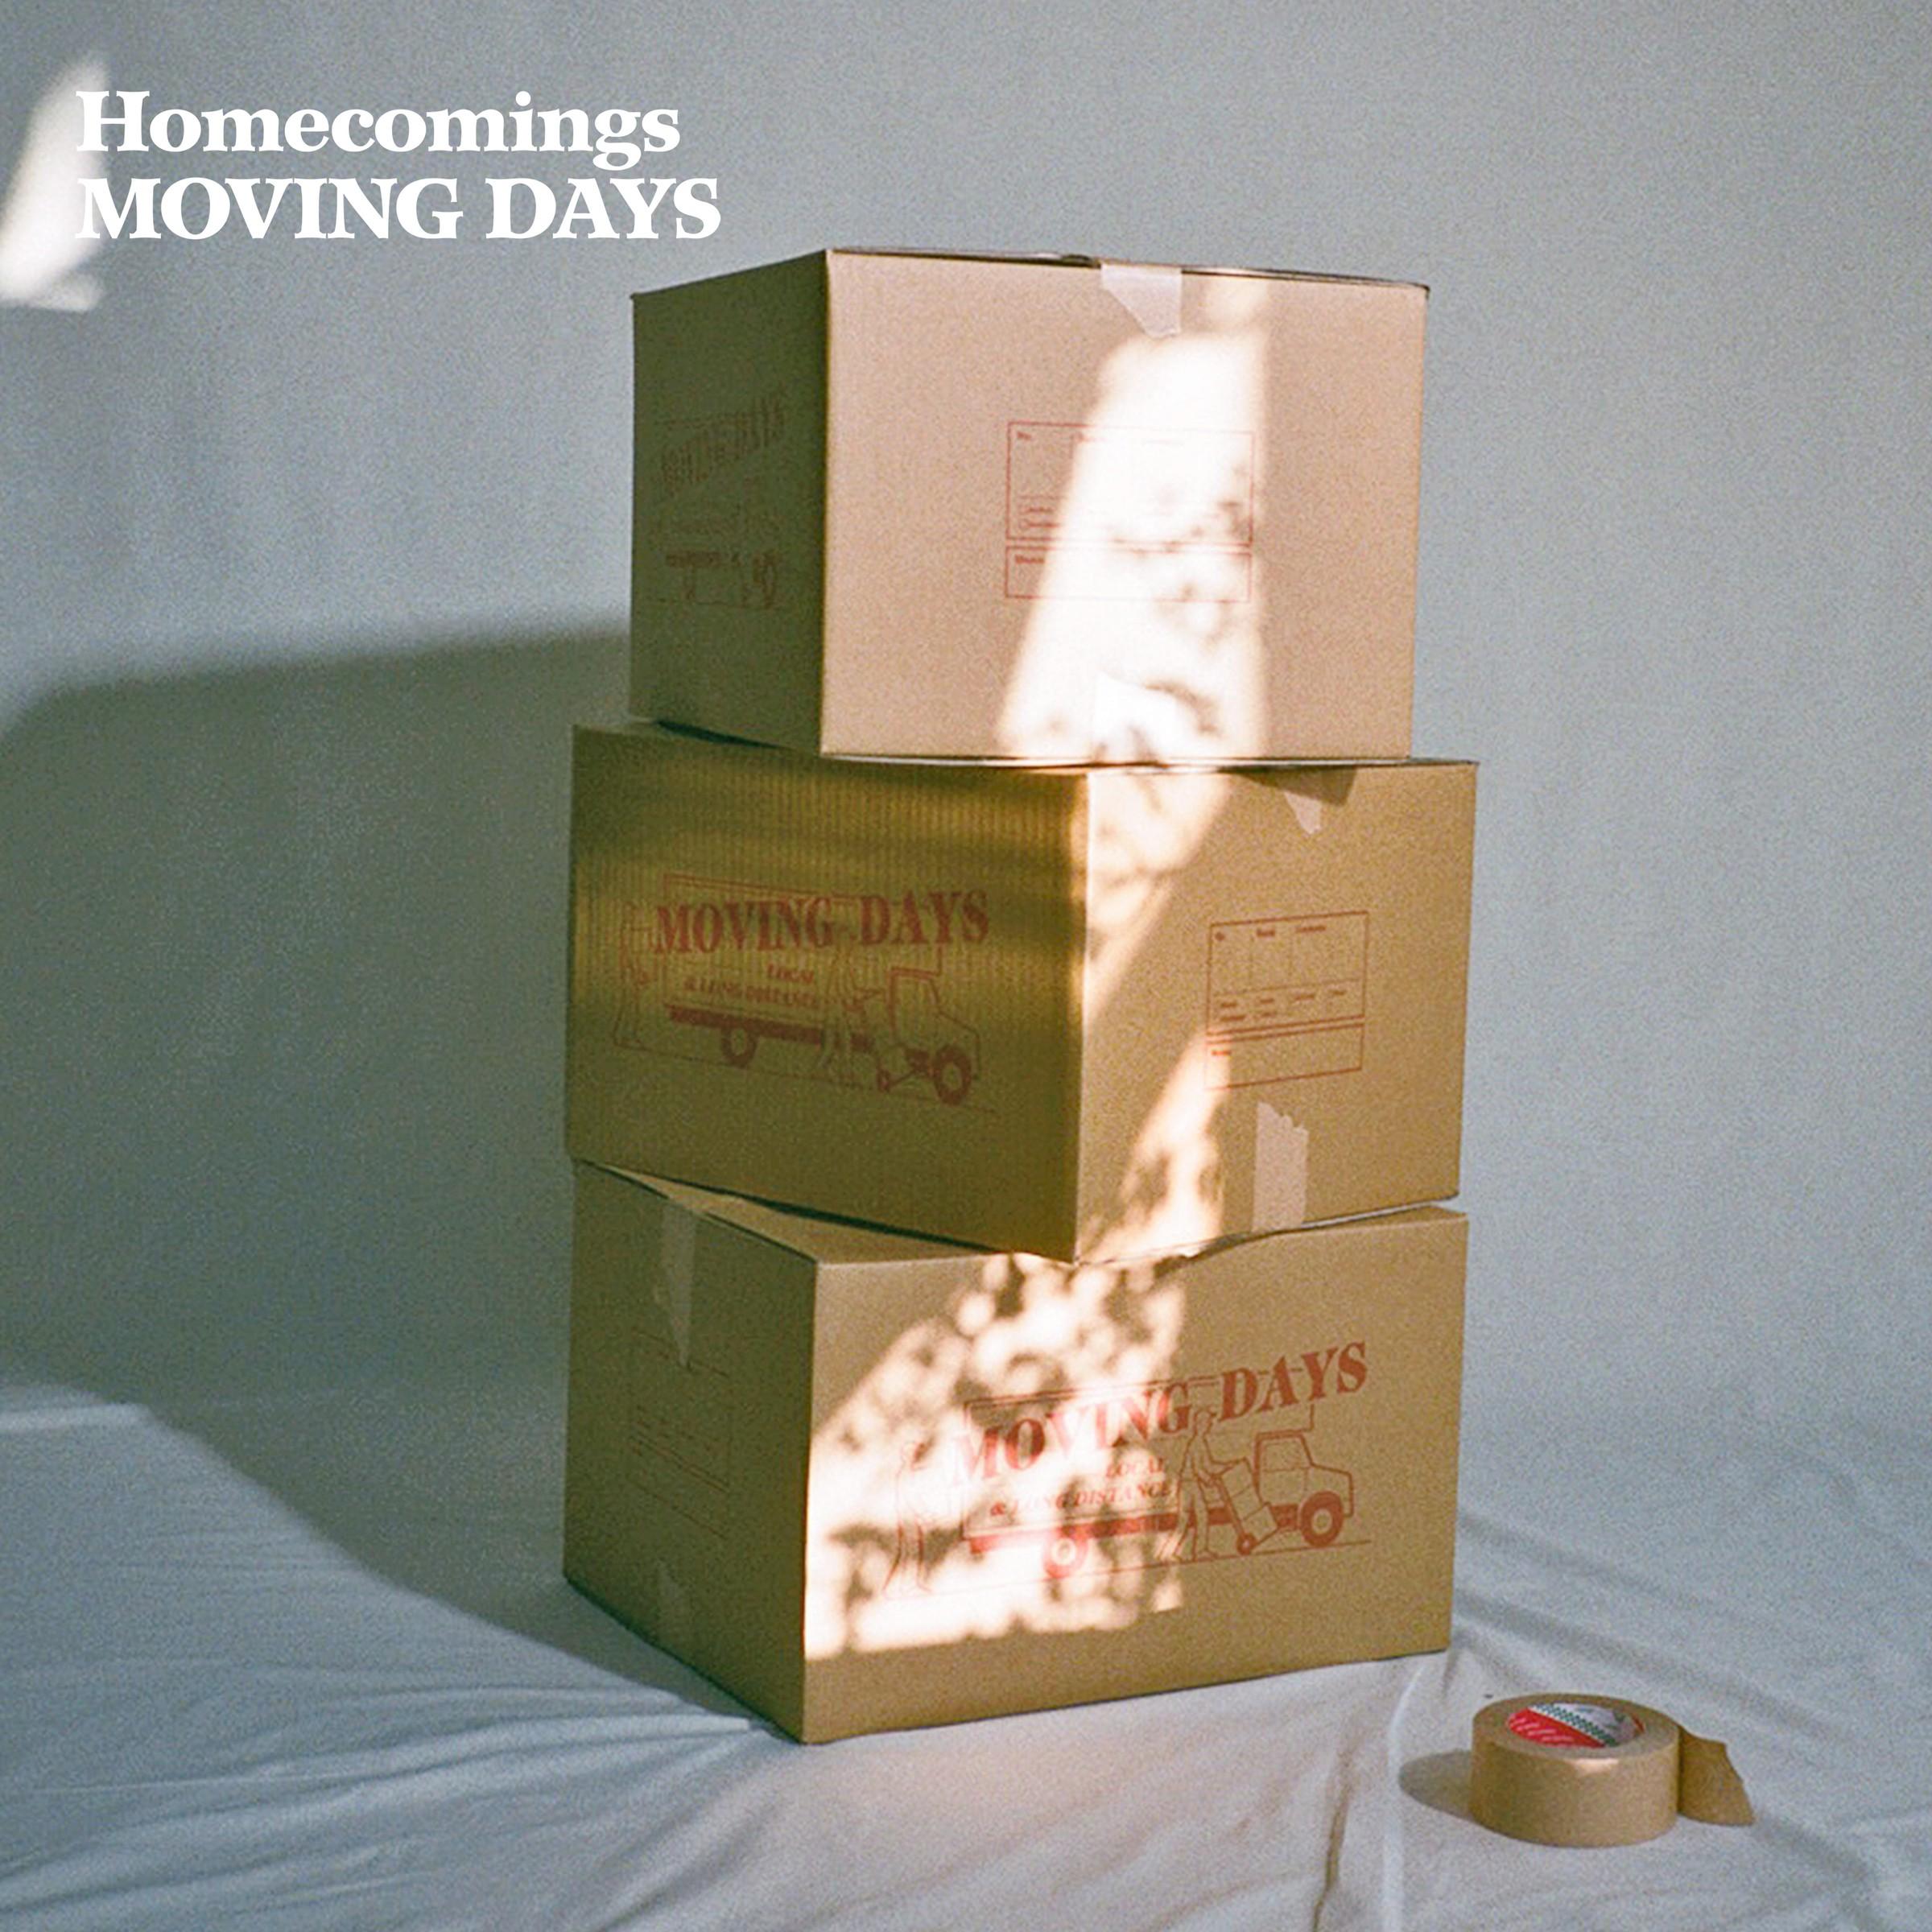 Homecomings – Moving Days [FLAC / 24bit Lossless / WEB] [2021.05.12]